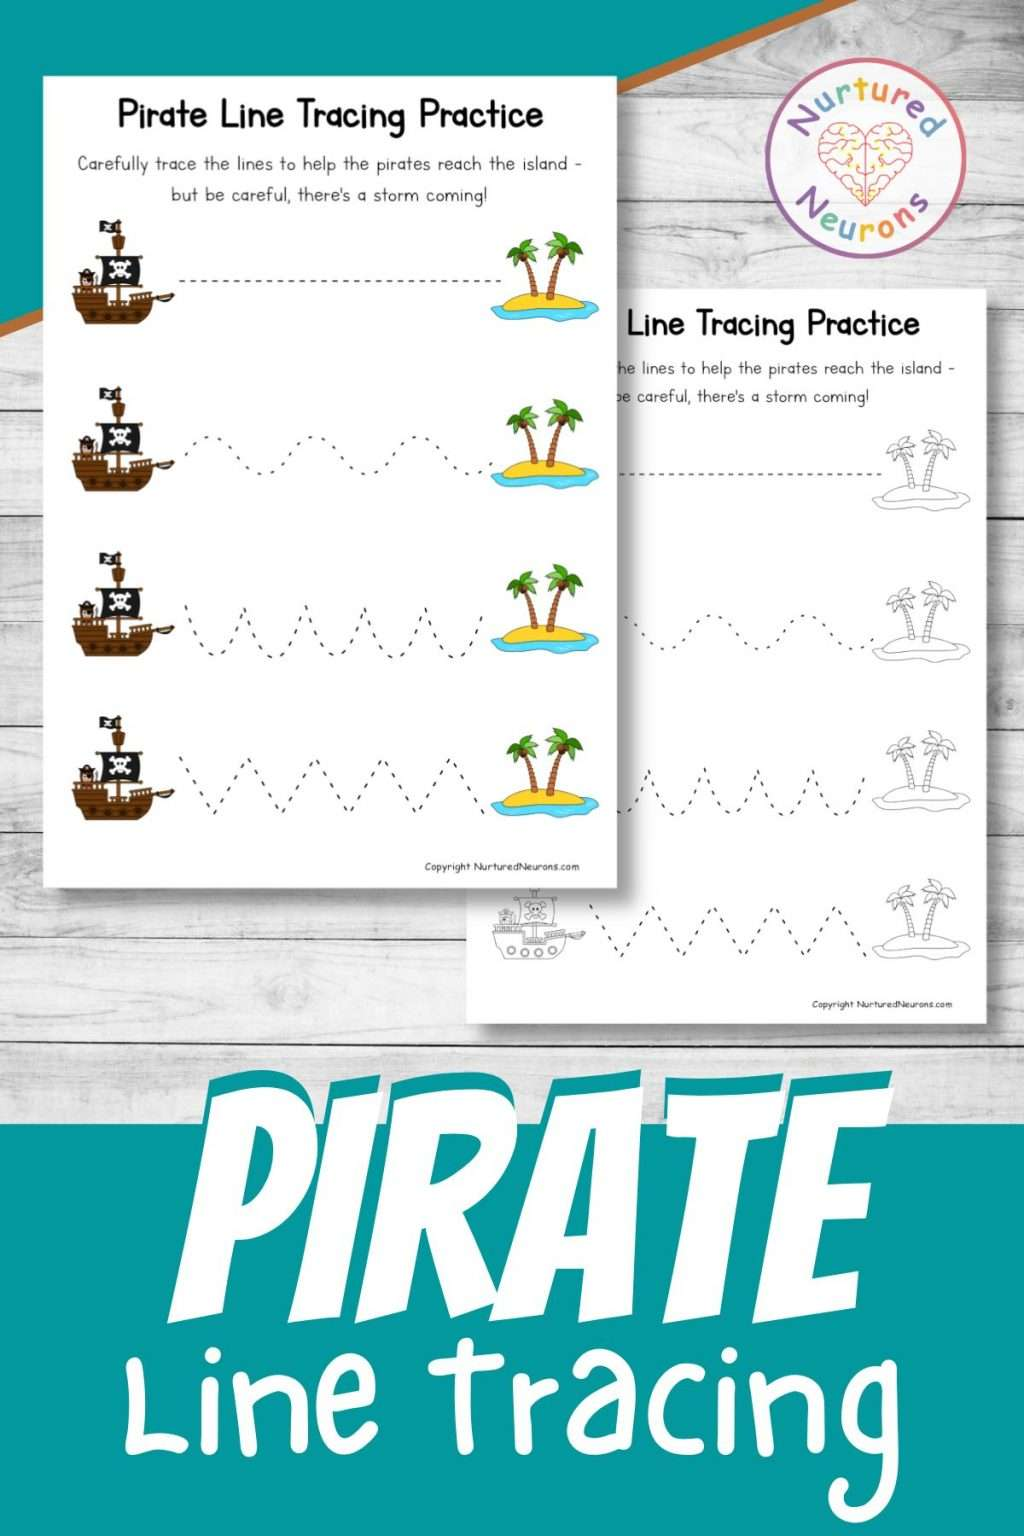 Pirate line tracing worksheets for preschool and kindergarten - practice prewriting skills